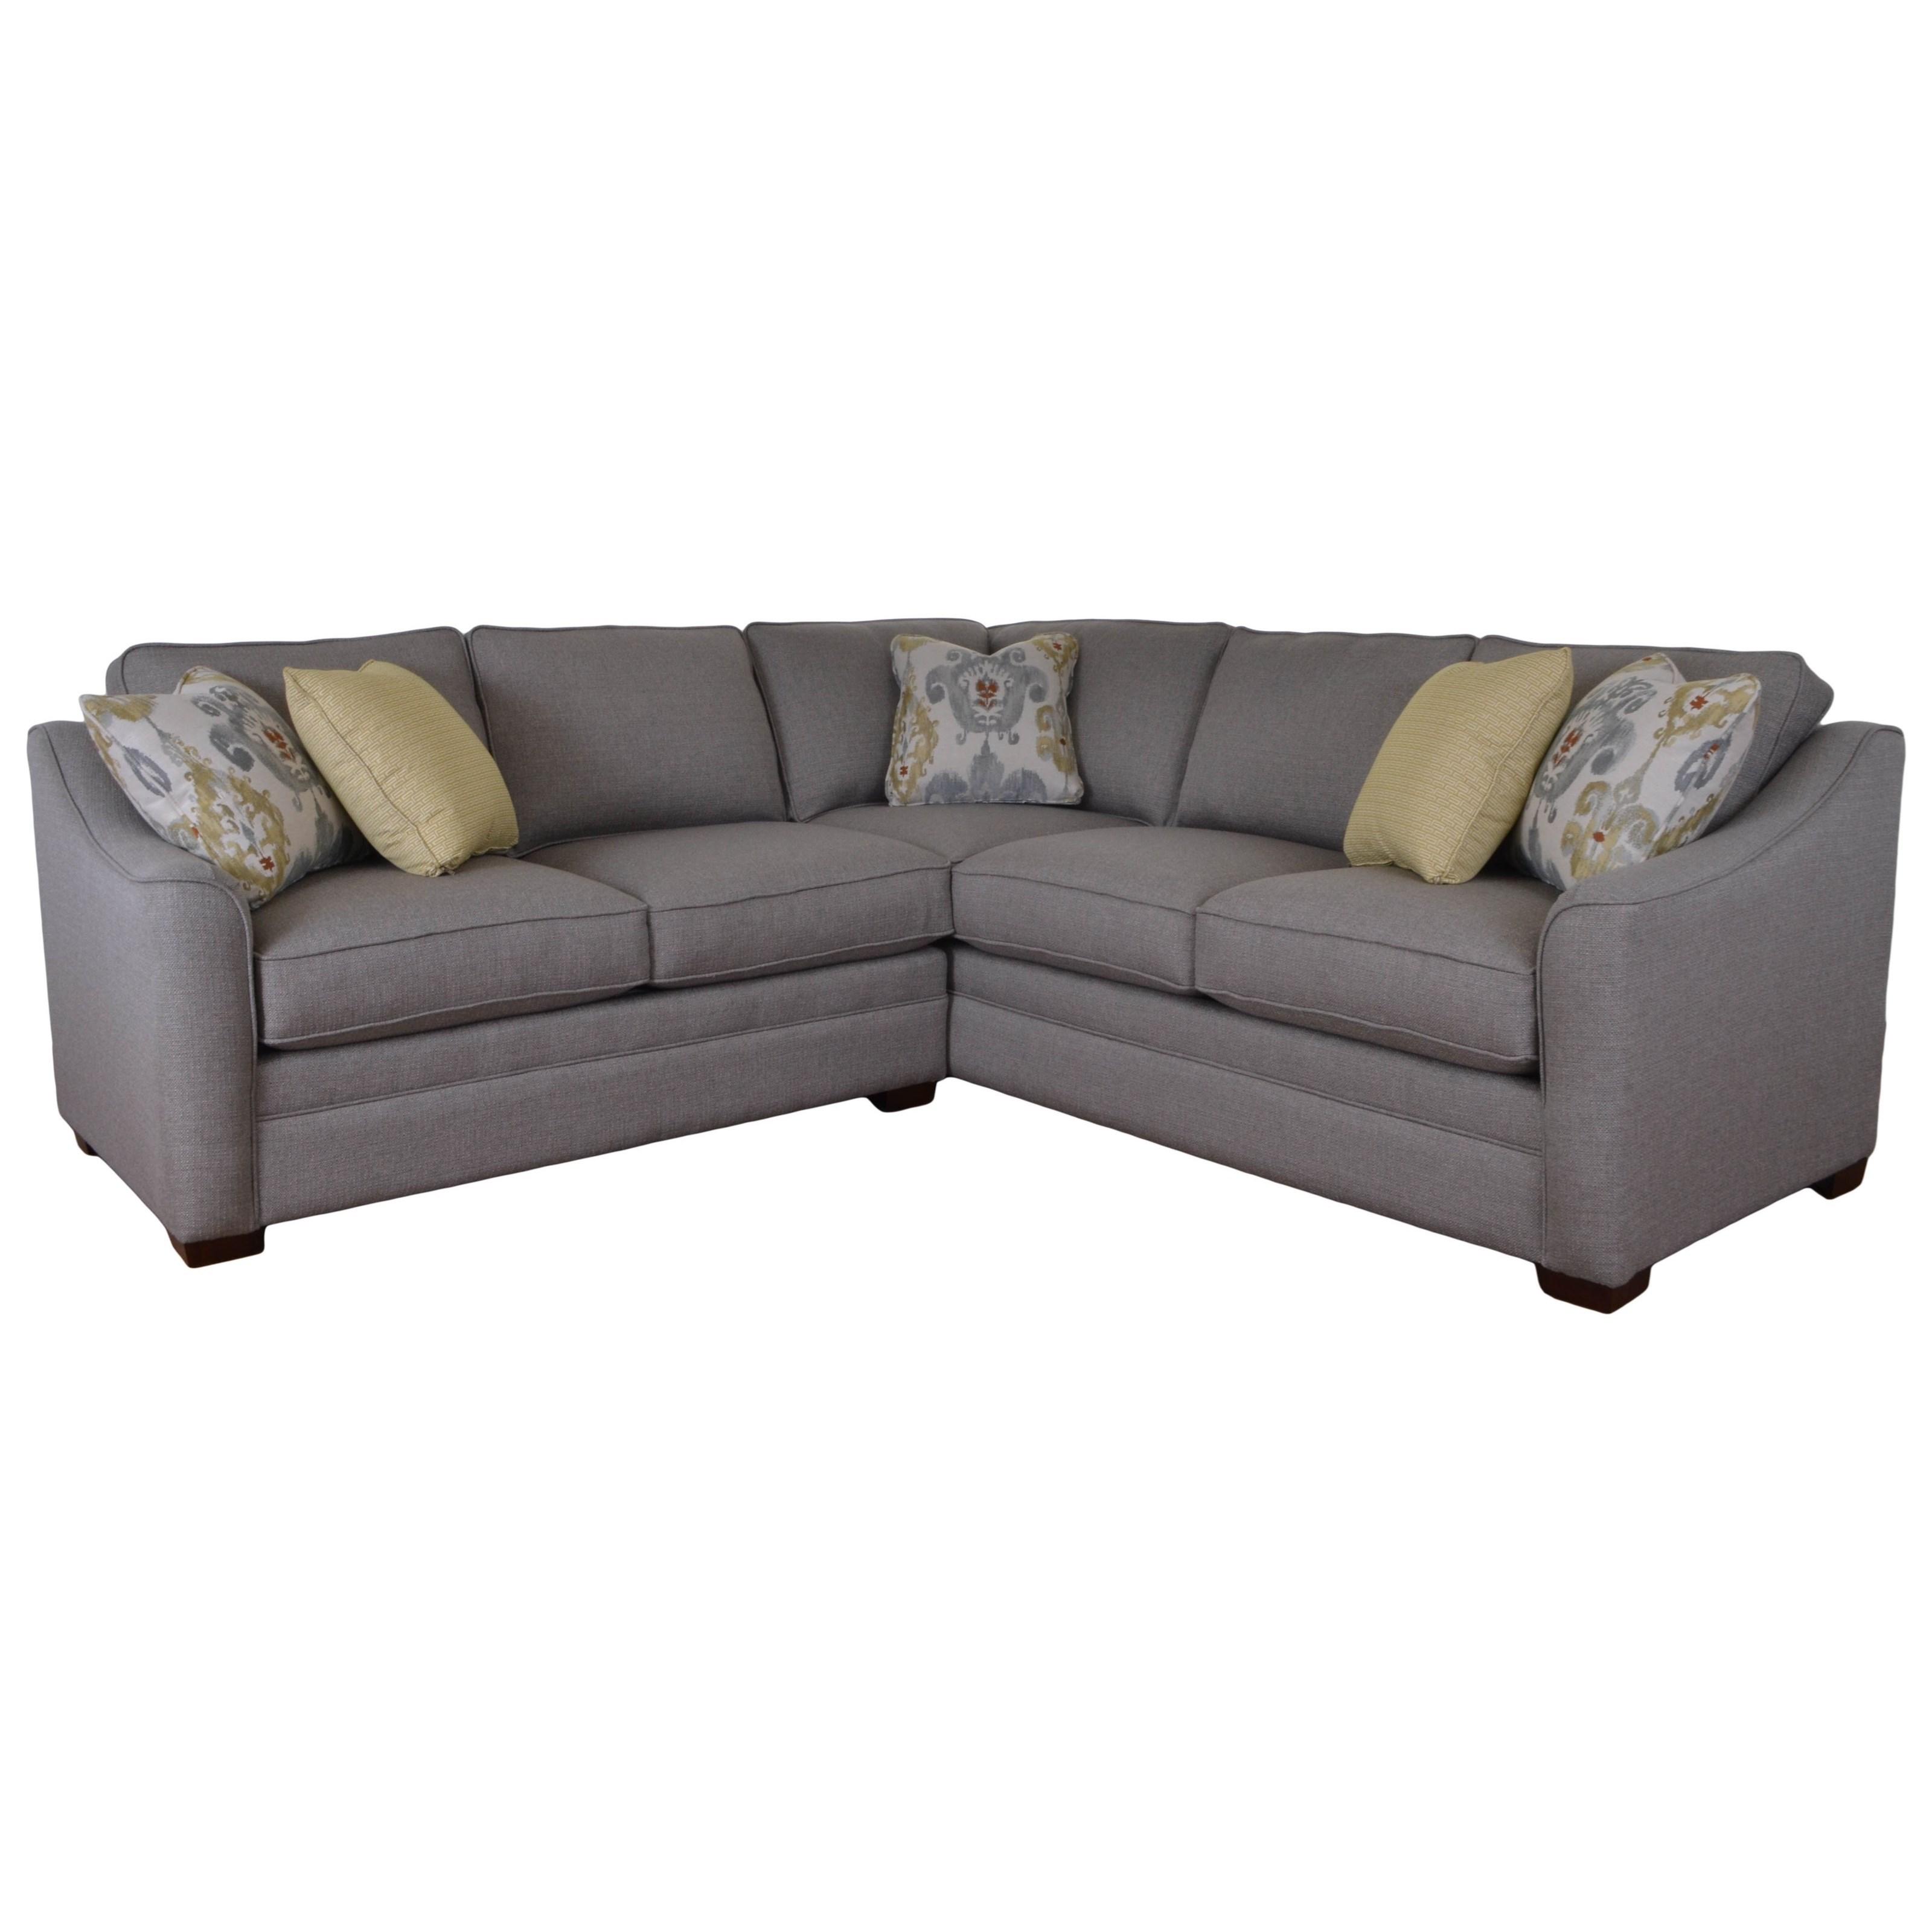 Merveilleux Craftmaster F9 Custom Collection2 Pc Customizable Sectional Sofa ...